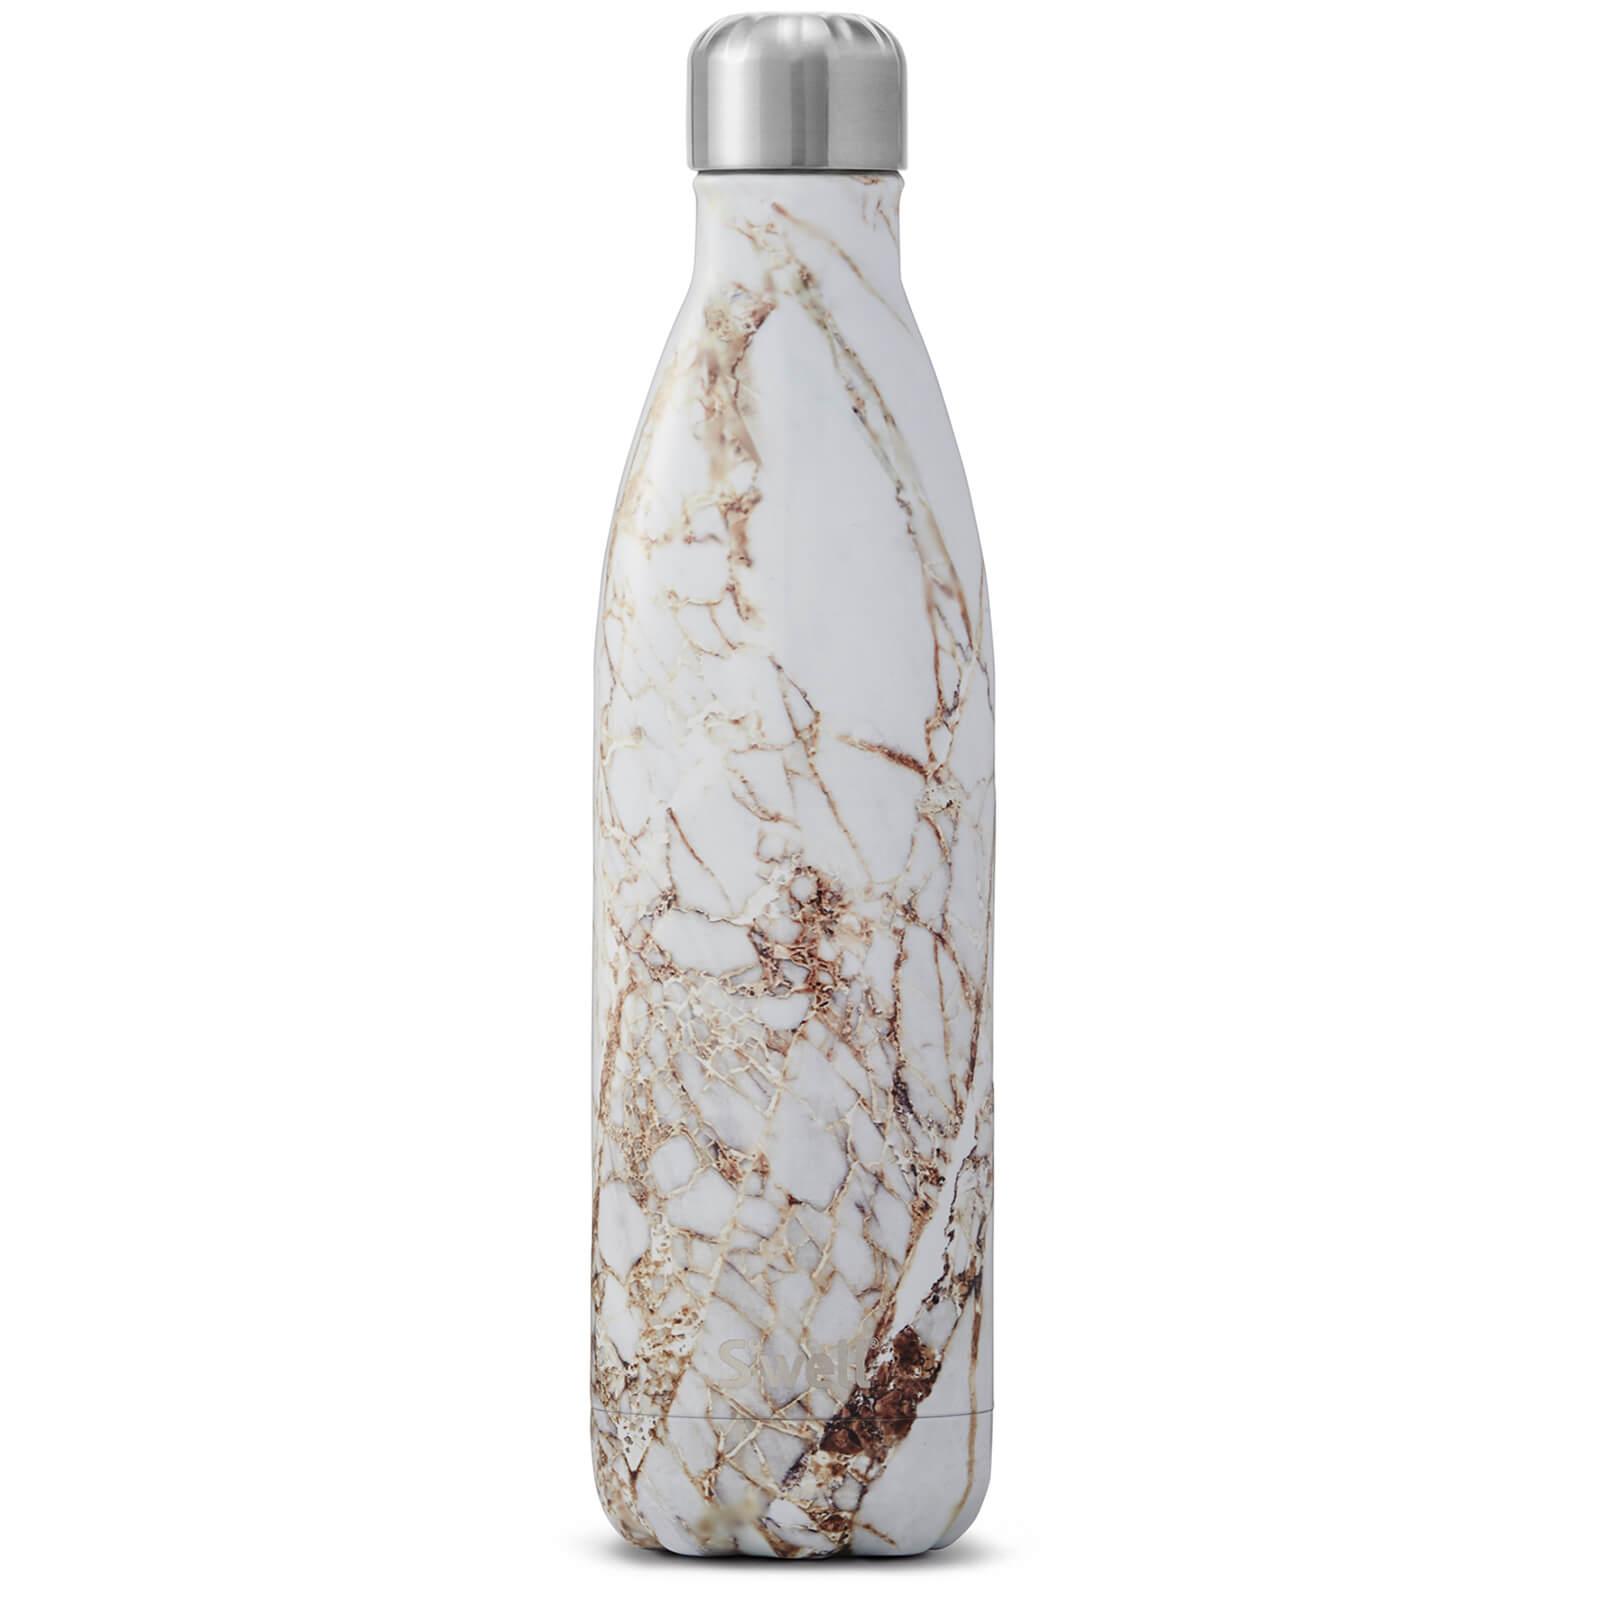 S'well The Calacatta Gold Water Bottle 750ml